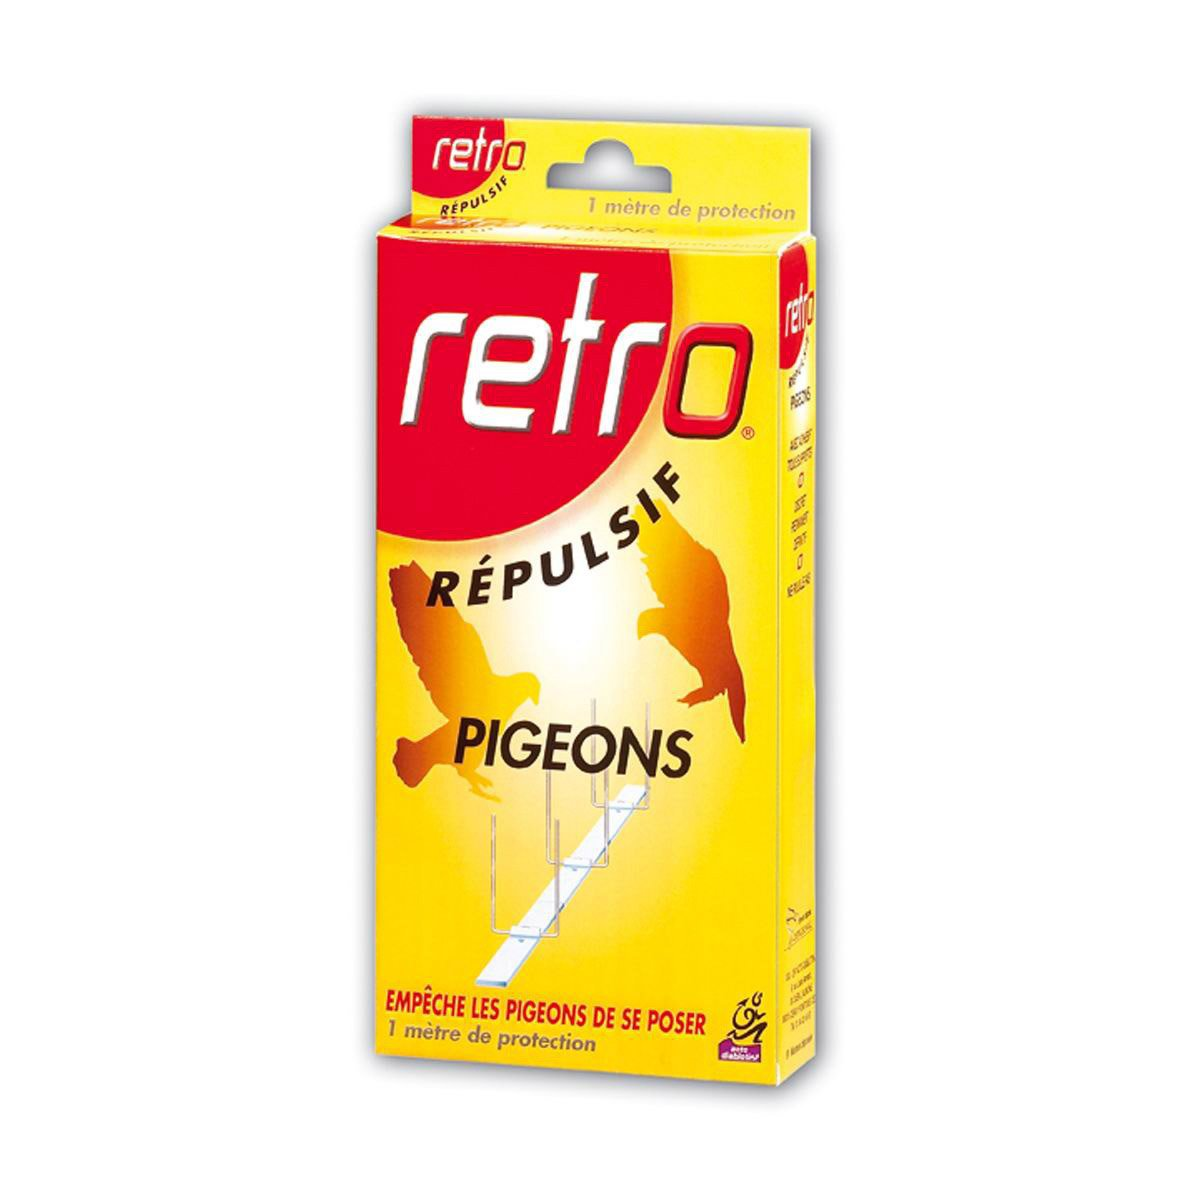 ultrason pigeon retro